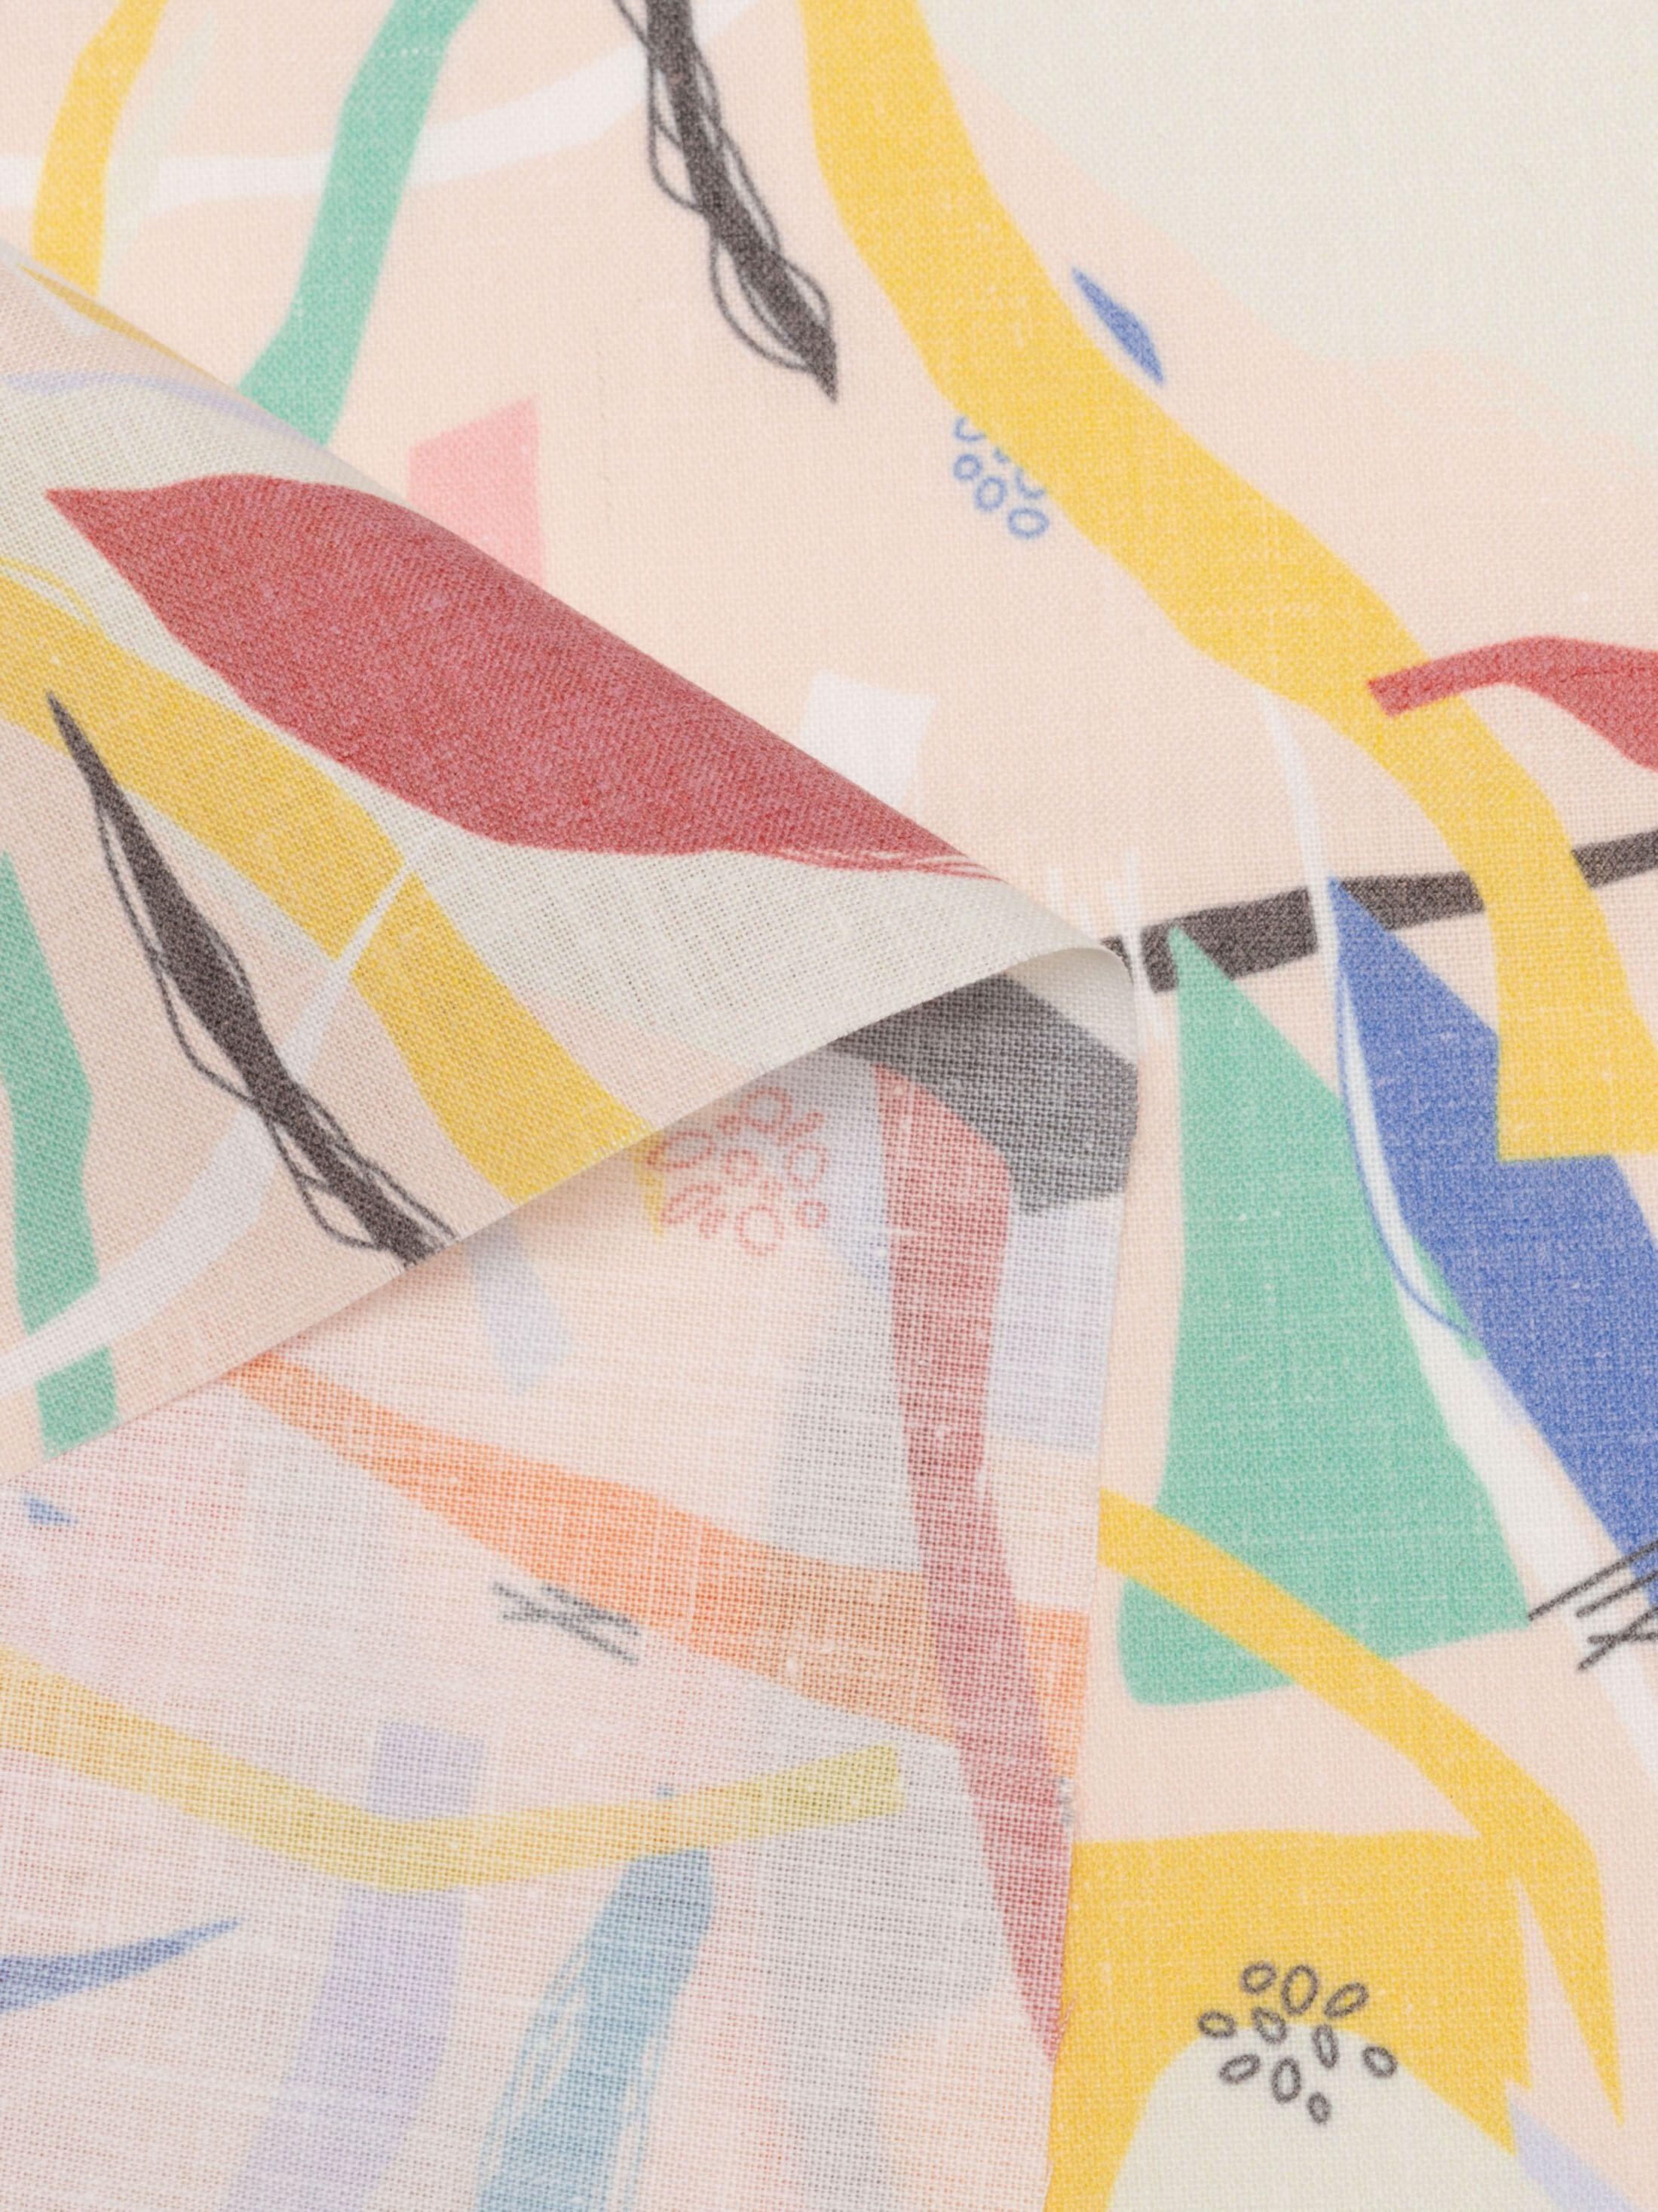 printing Vintage Fade fabric on demand